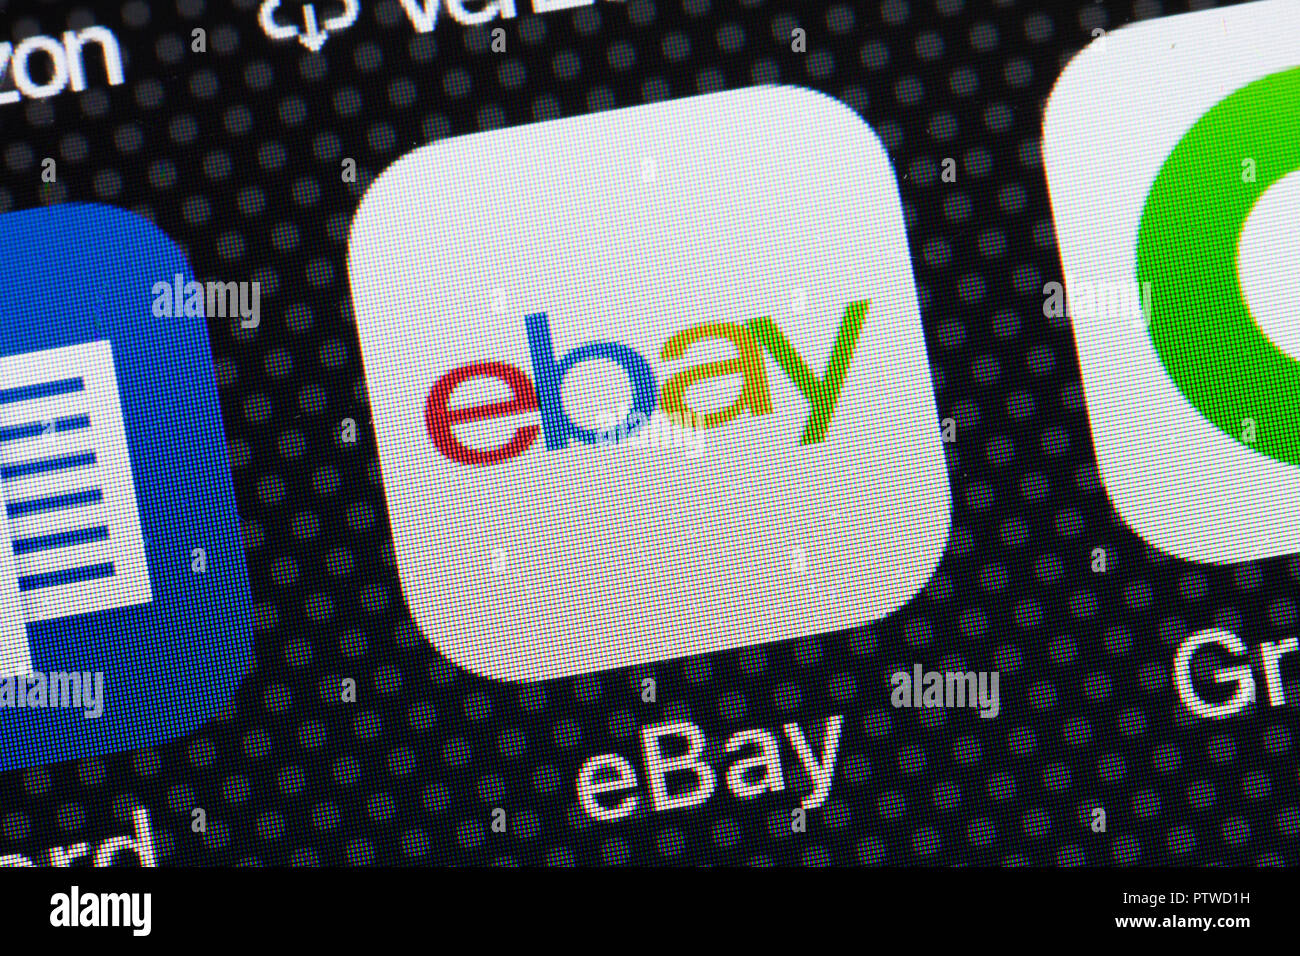 Ebay App Icon On Iphone Close Up Macro Usa Stock Photo Alamy